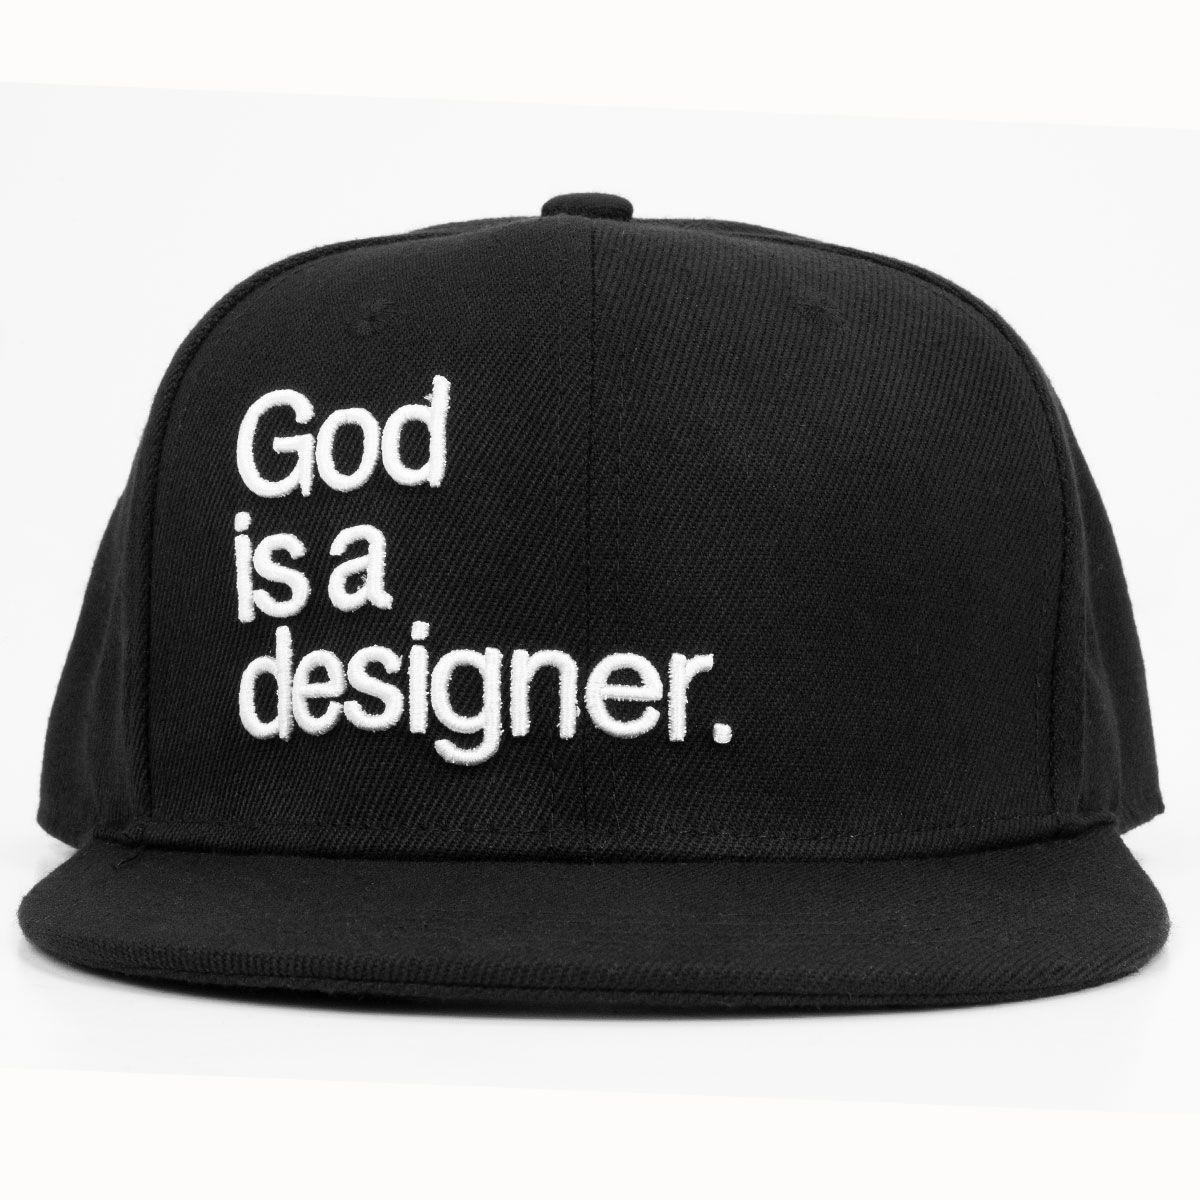 God Is A Designer Hat Hat Designs Hats Flat Bill Hats